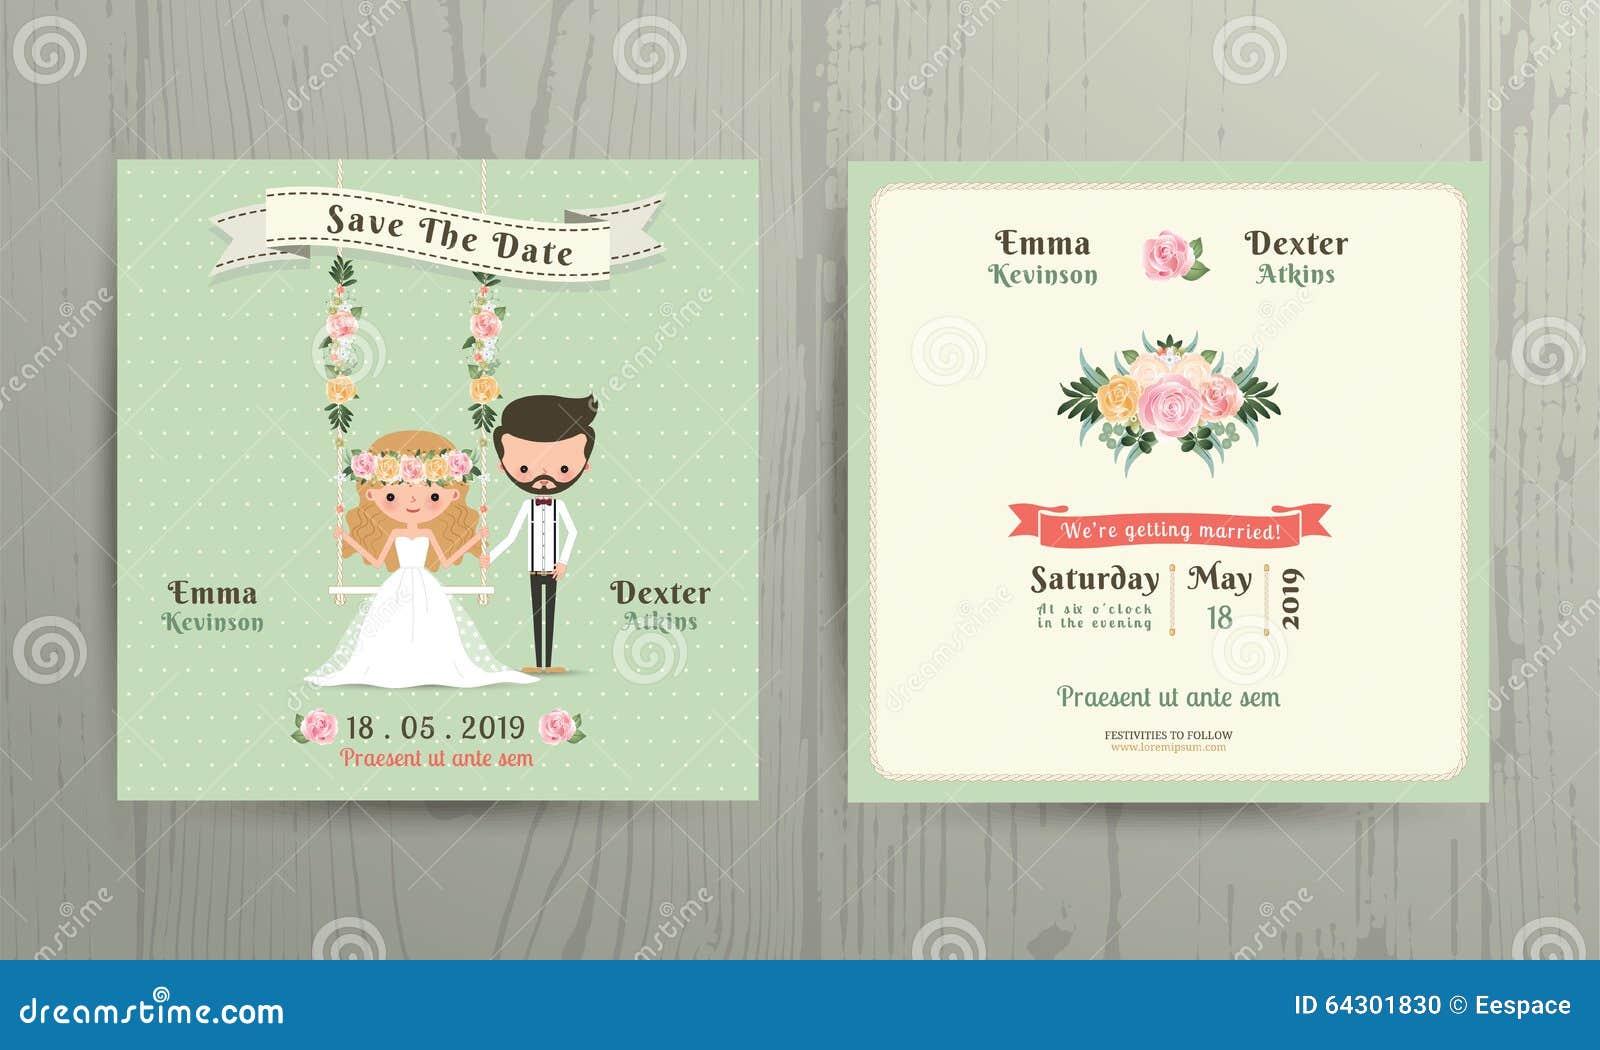 Rustic Wedding Cartoon Bride And Groom Couple Invitation Card Stock